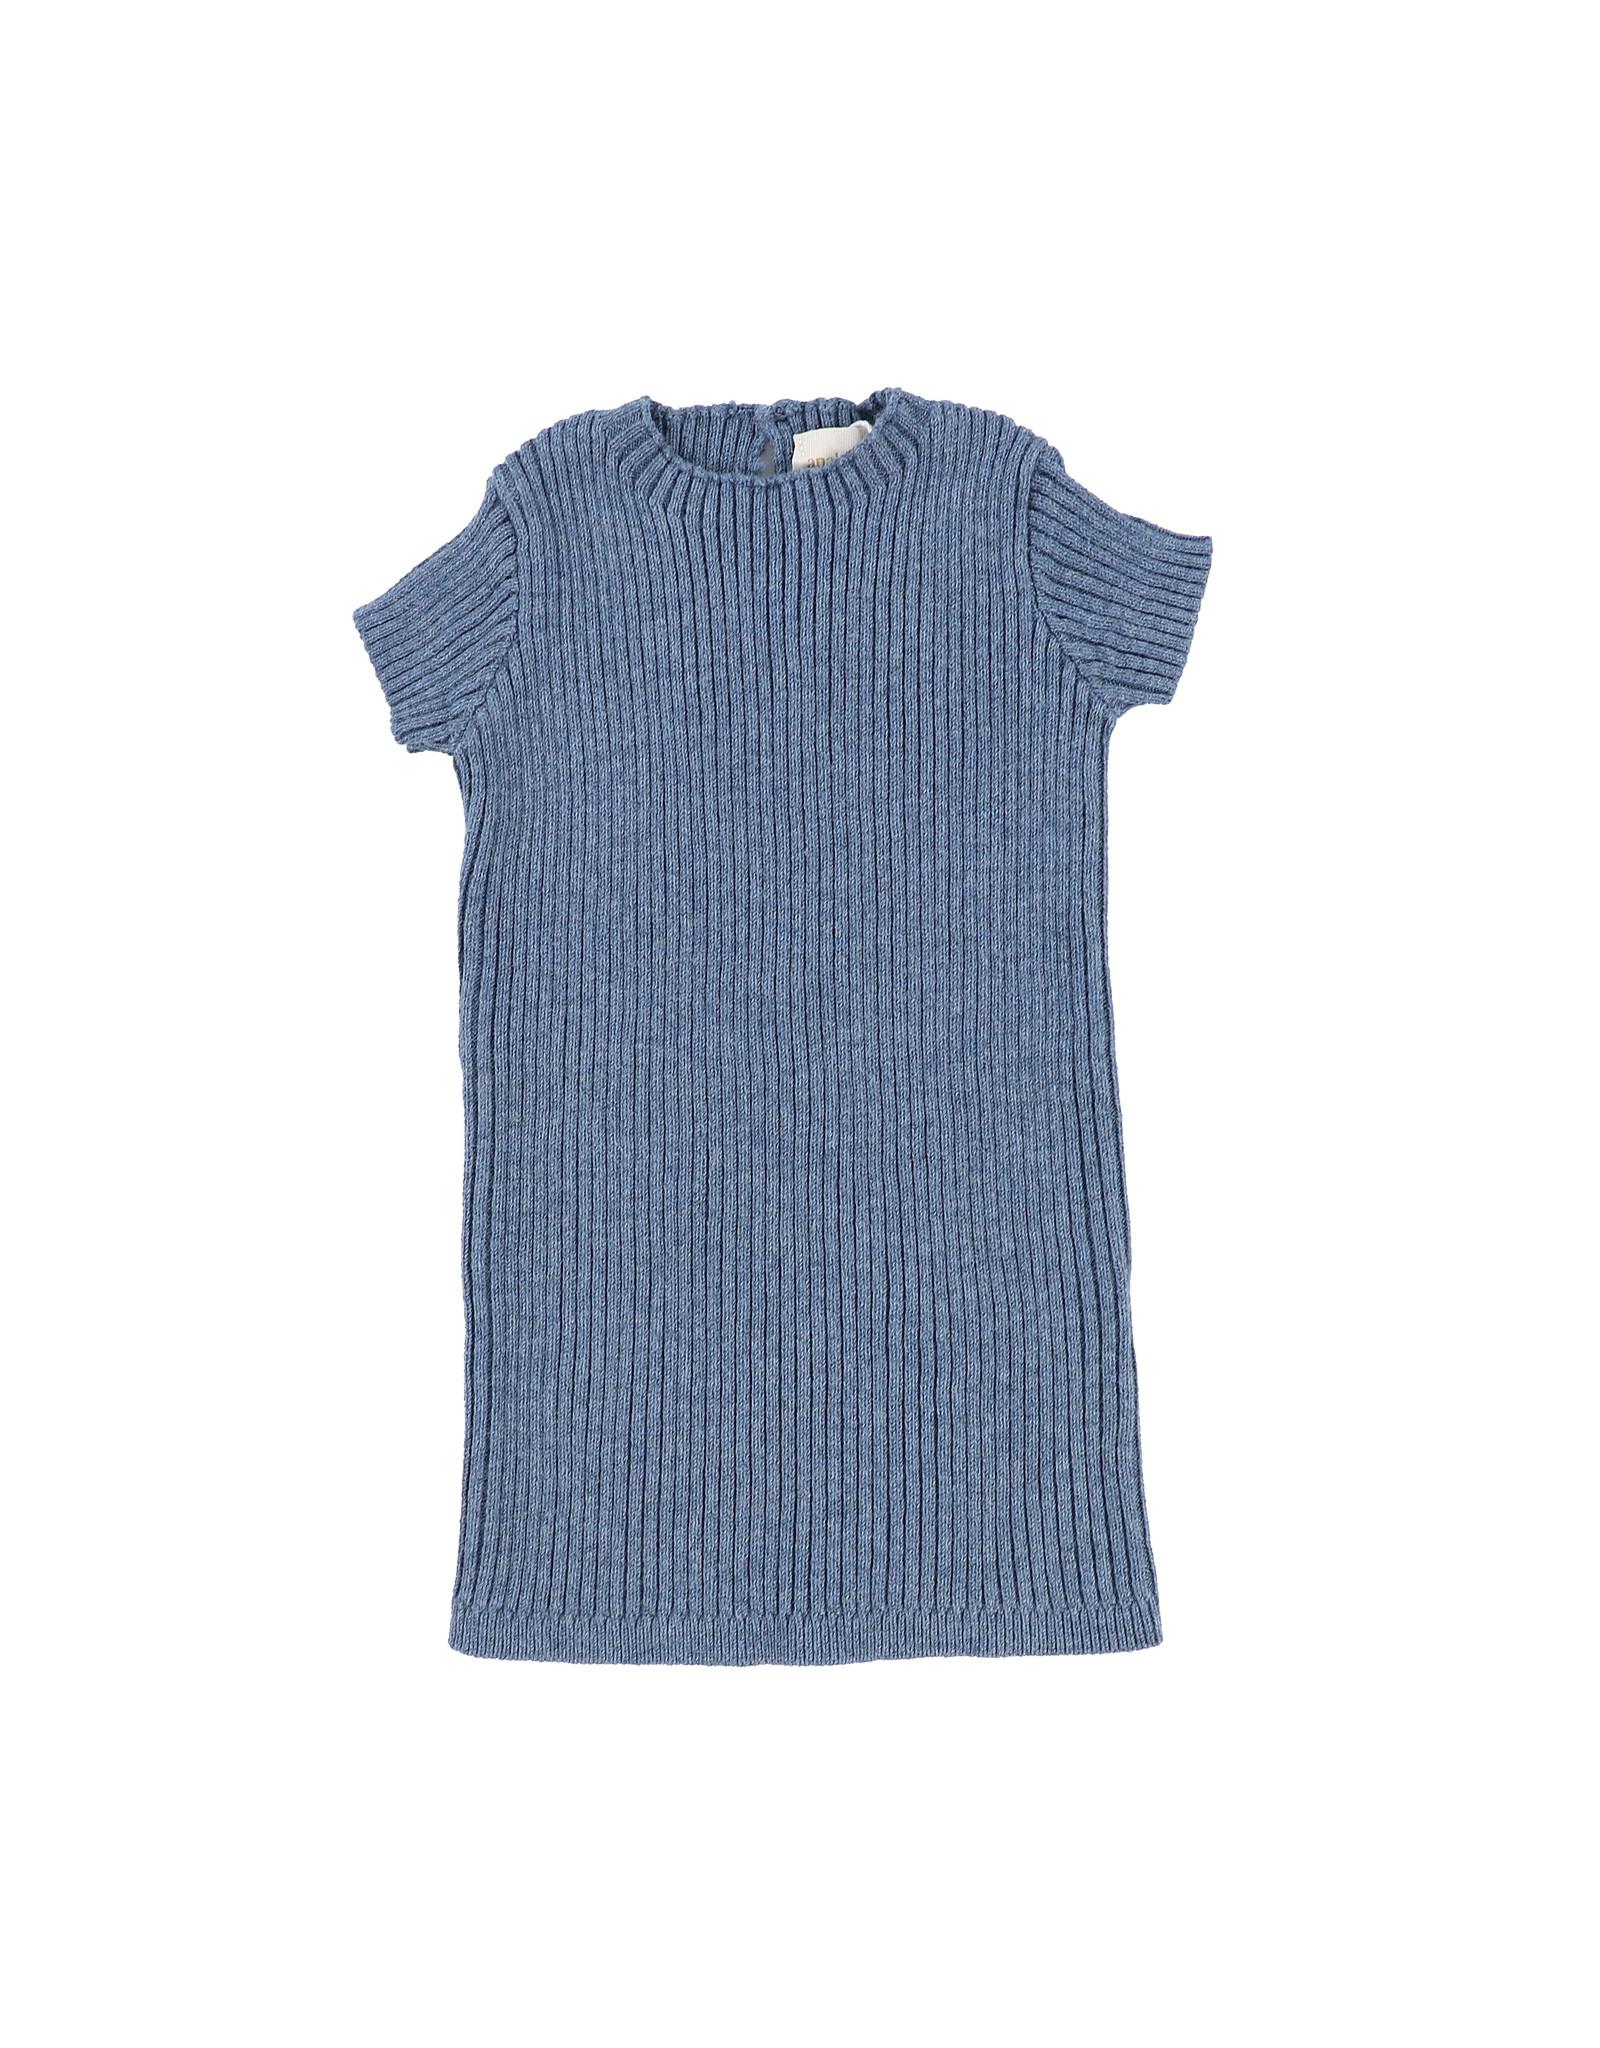 Analogie SS20 Short Sleeve Knit Sweater